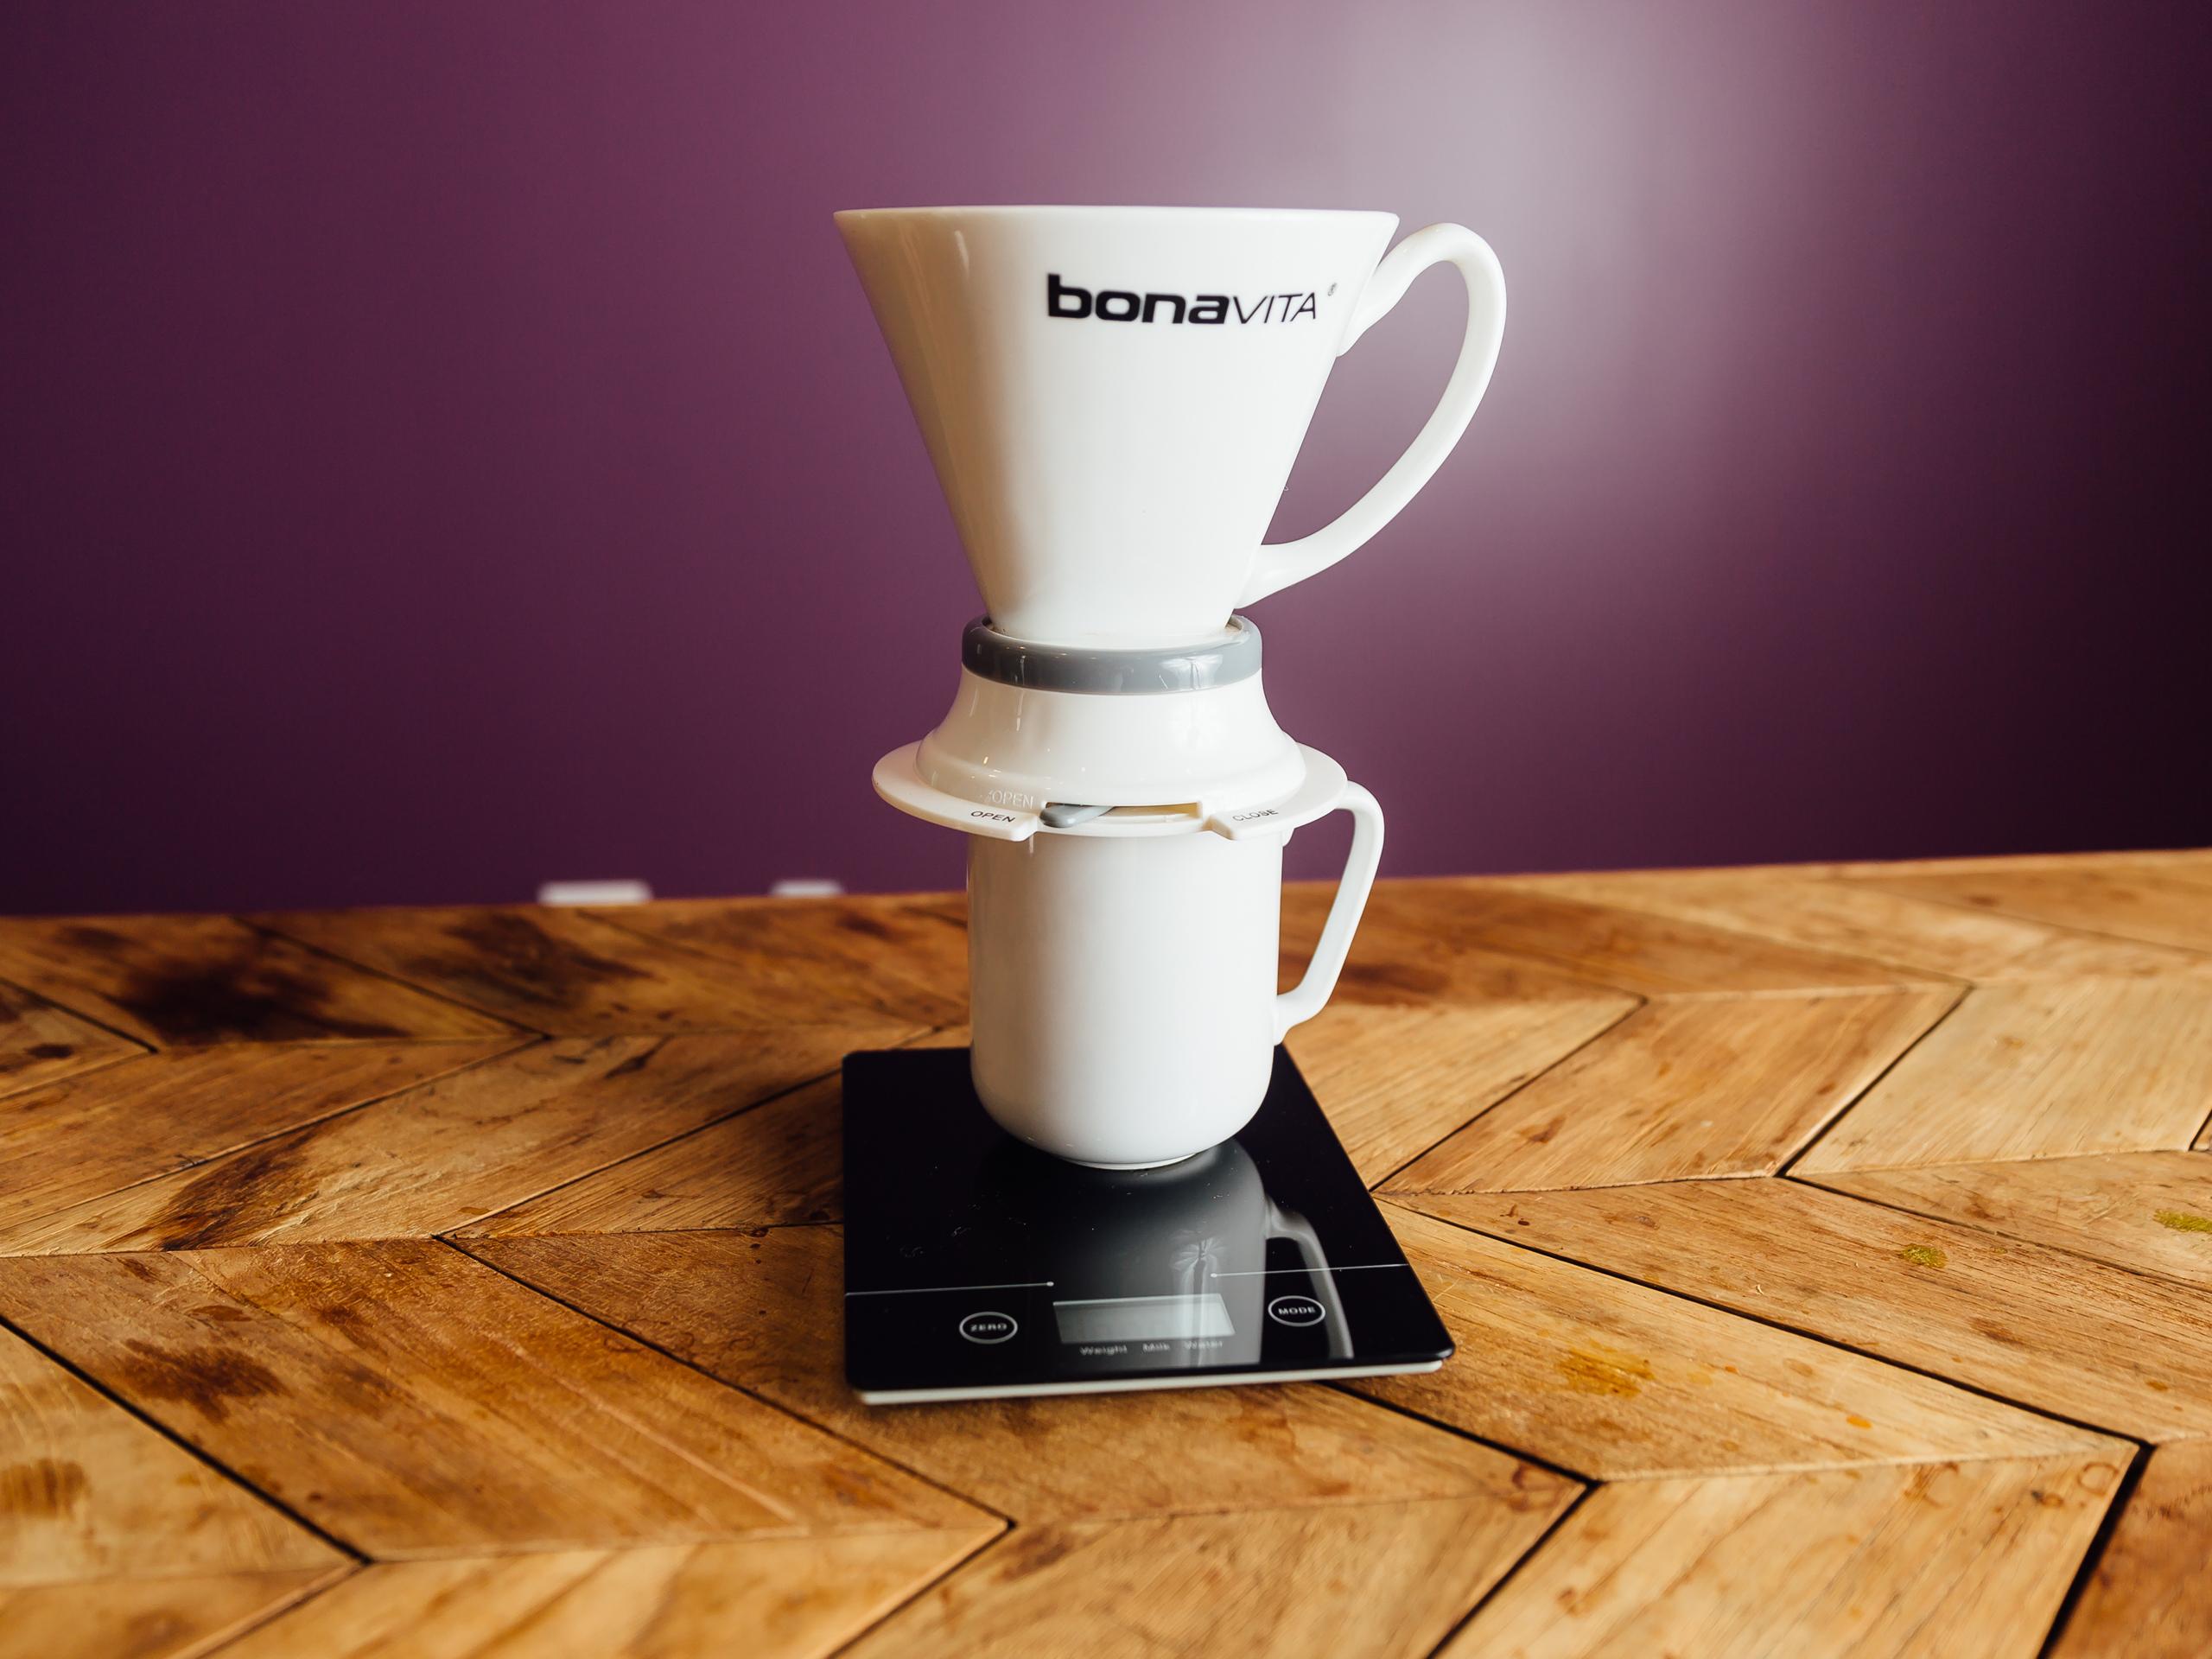 bonavita-immersion-dripper-product-photos-14.jpg